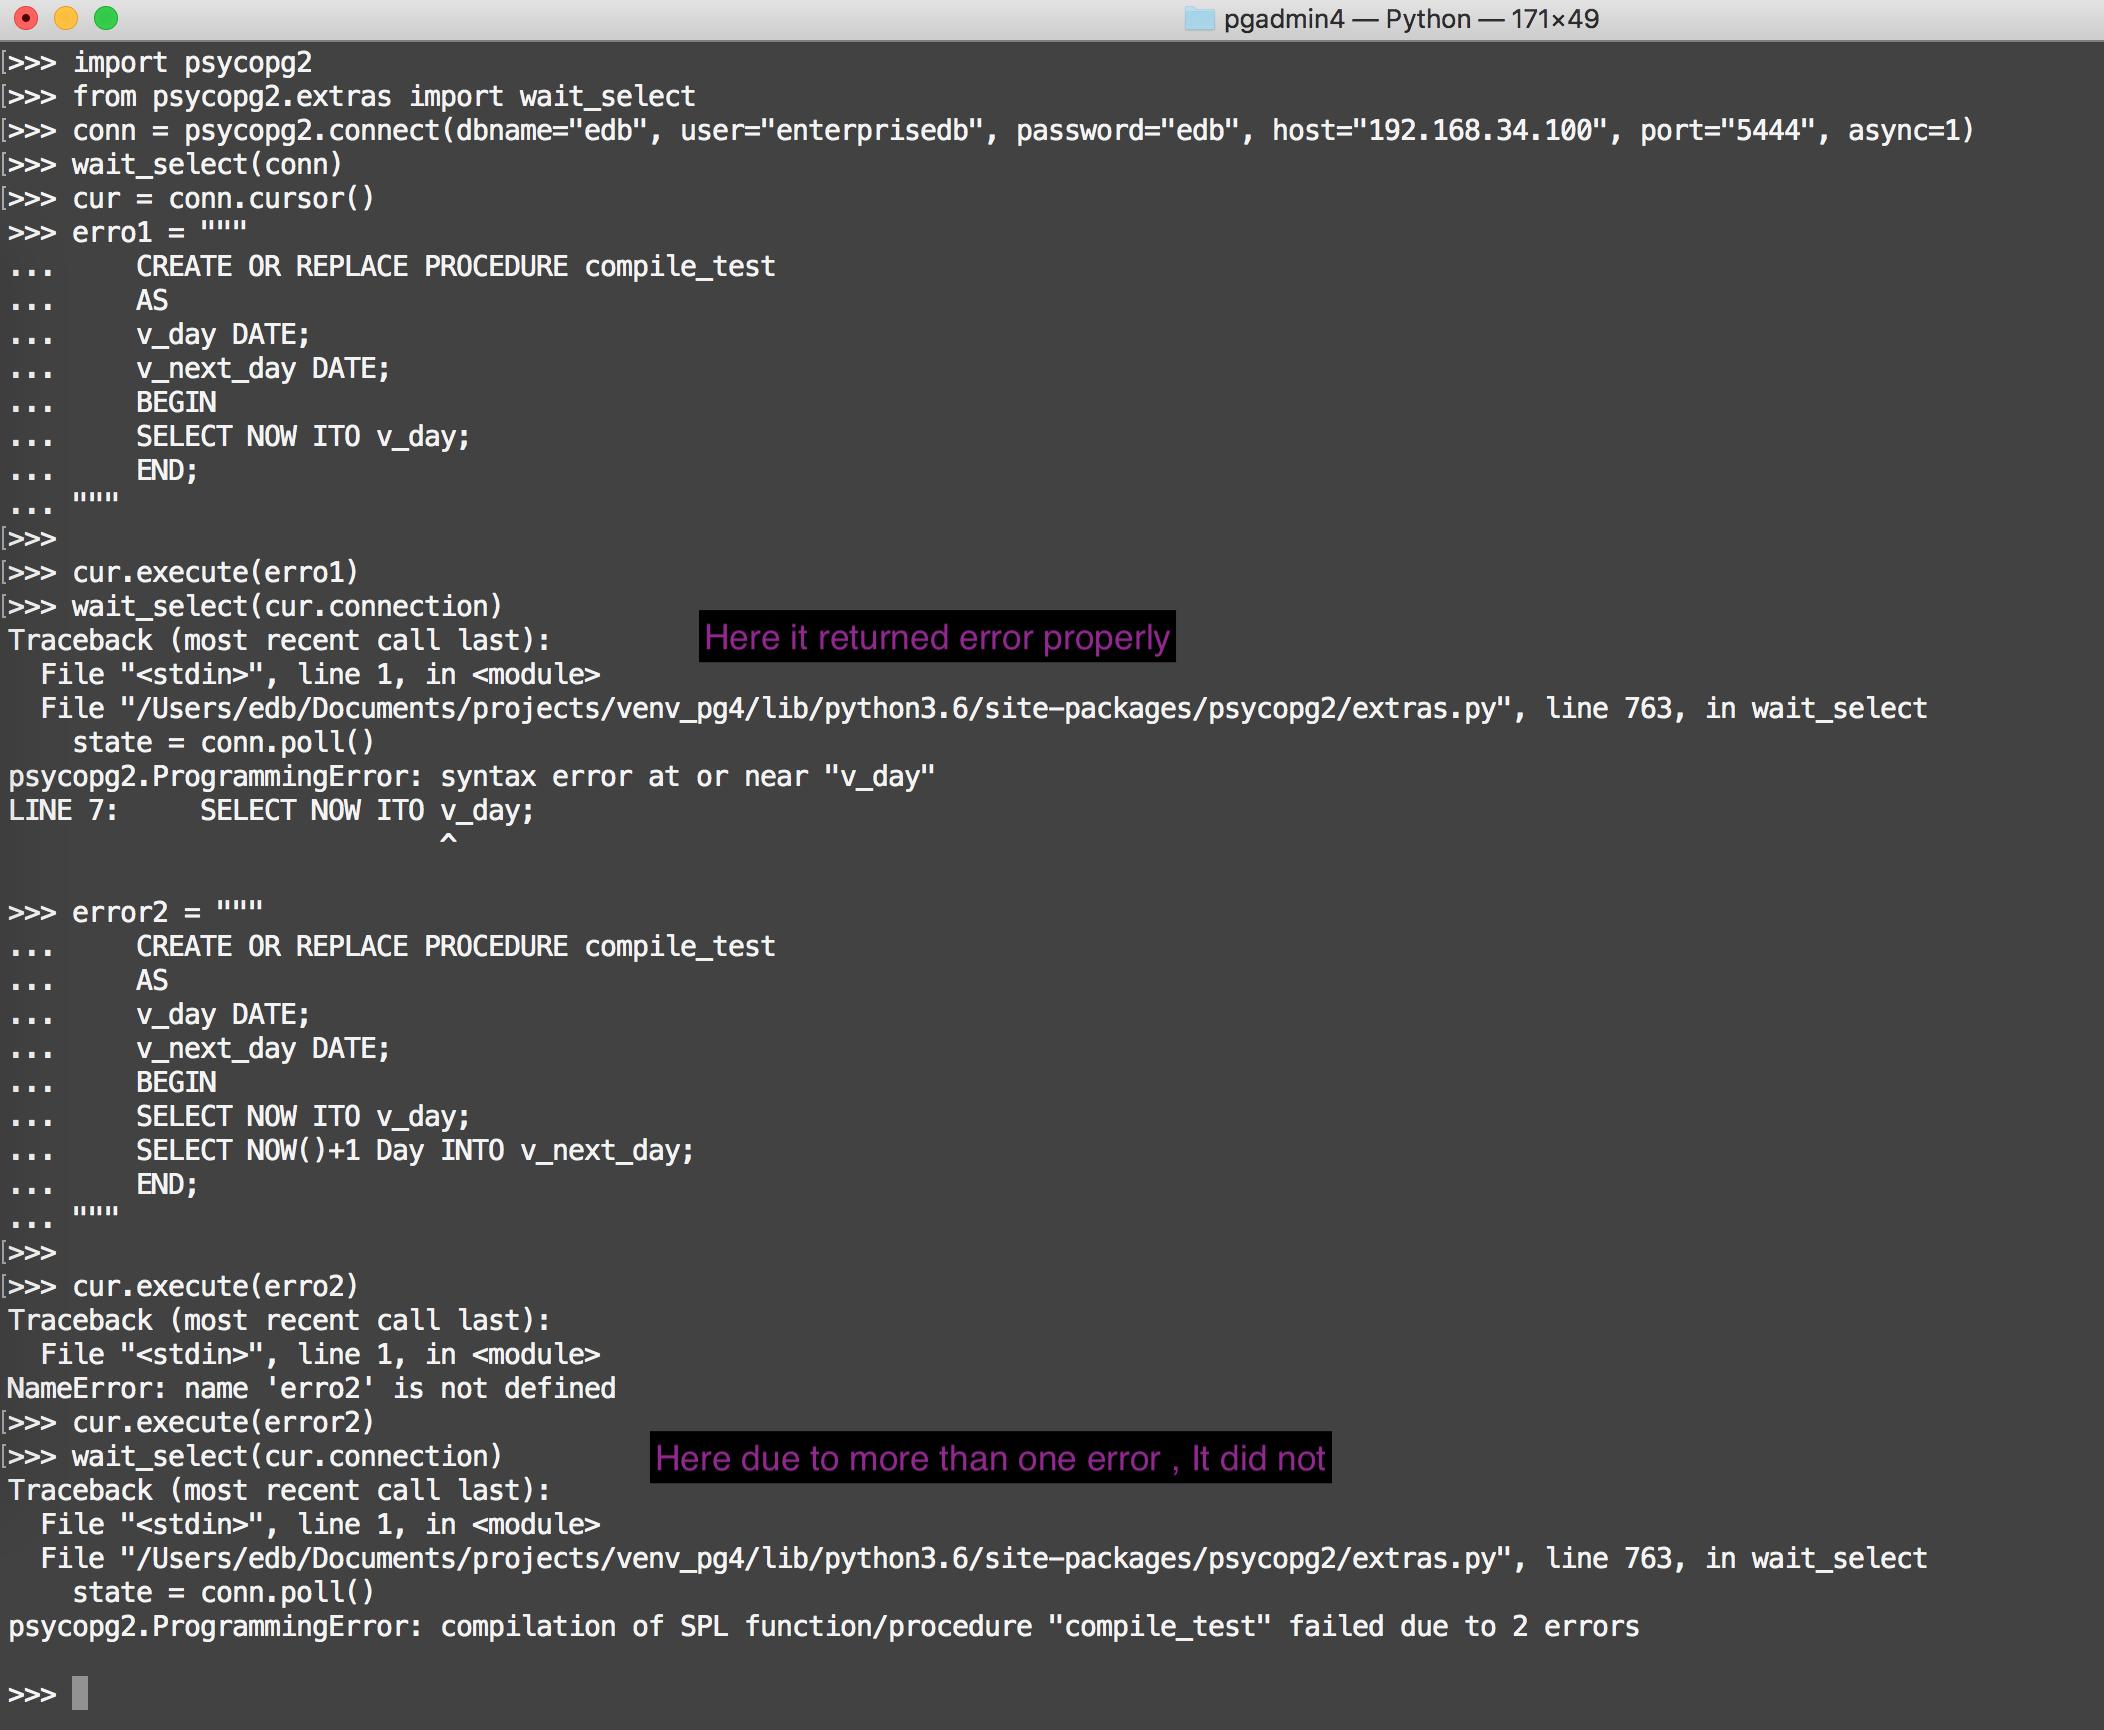 psycopg2 ProgrammingError exception did not return all the errors